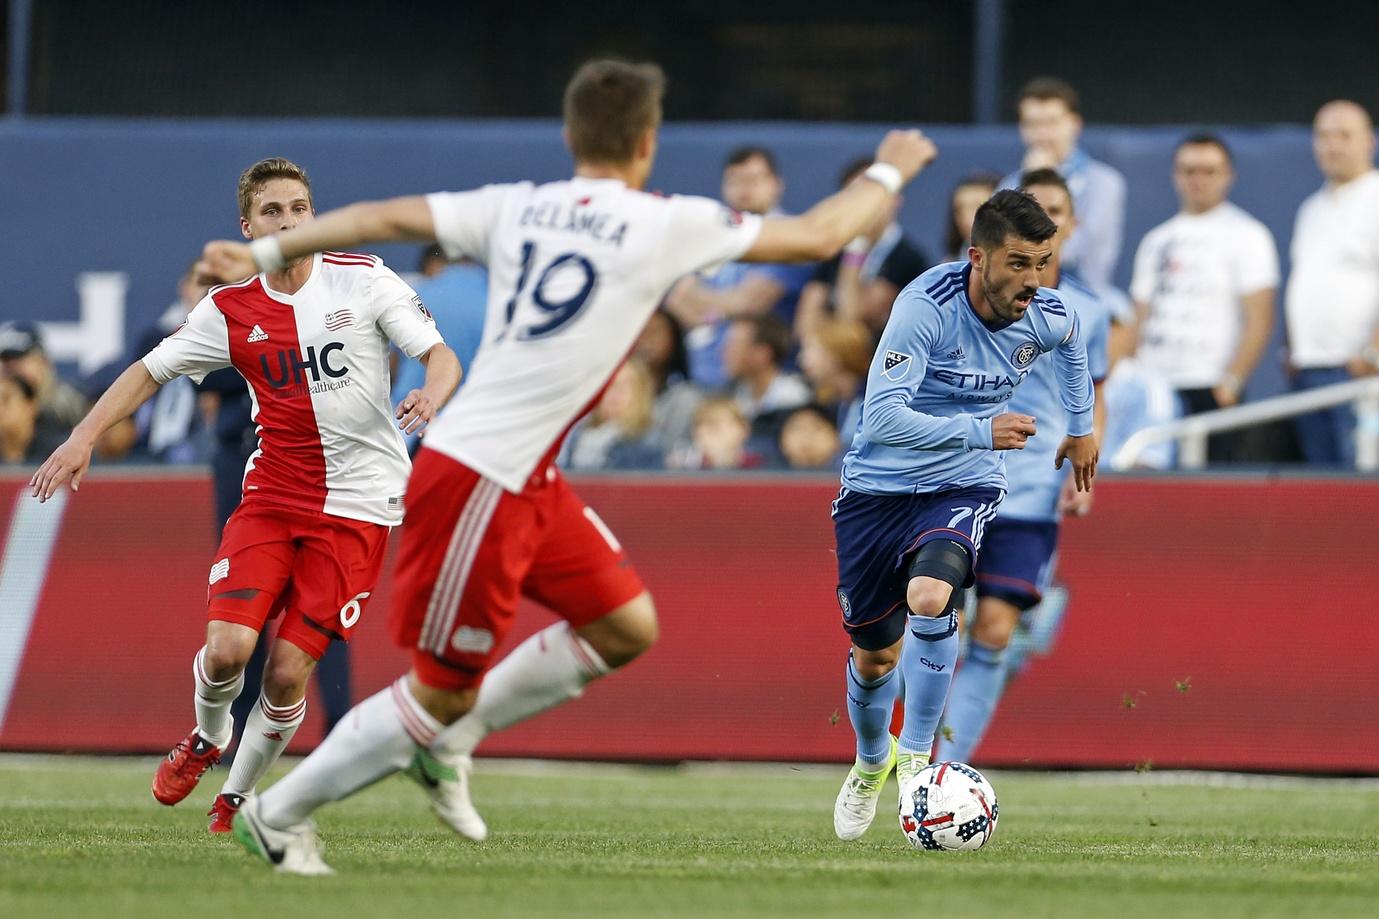 MLS: New England Revolution at New York City FC (usatoday.com)